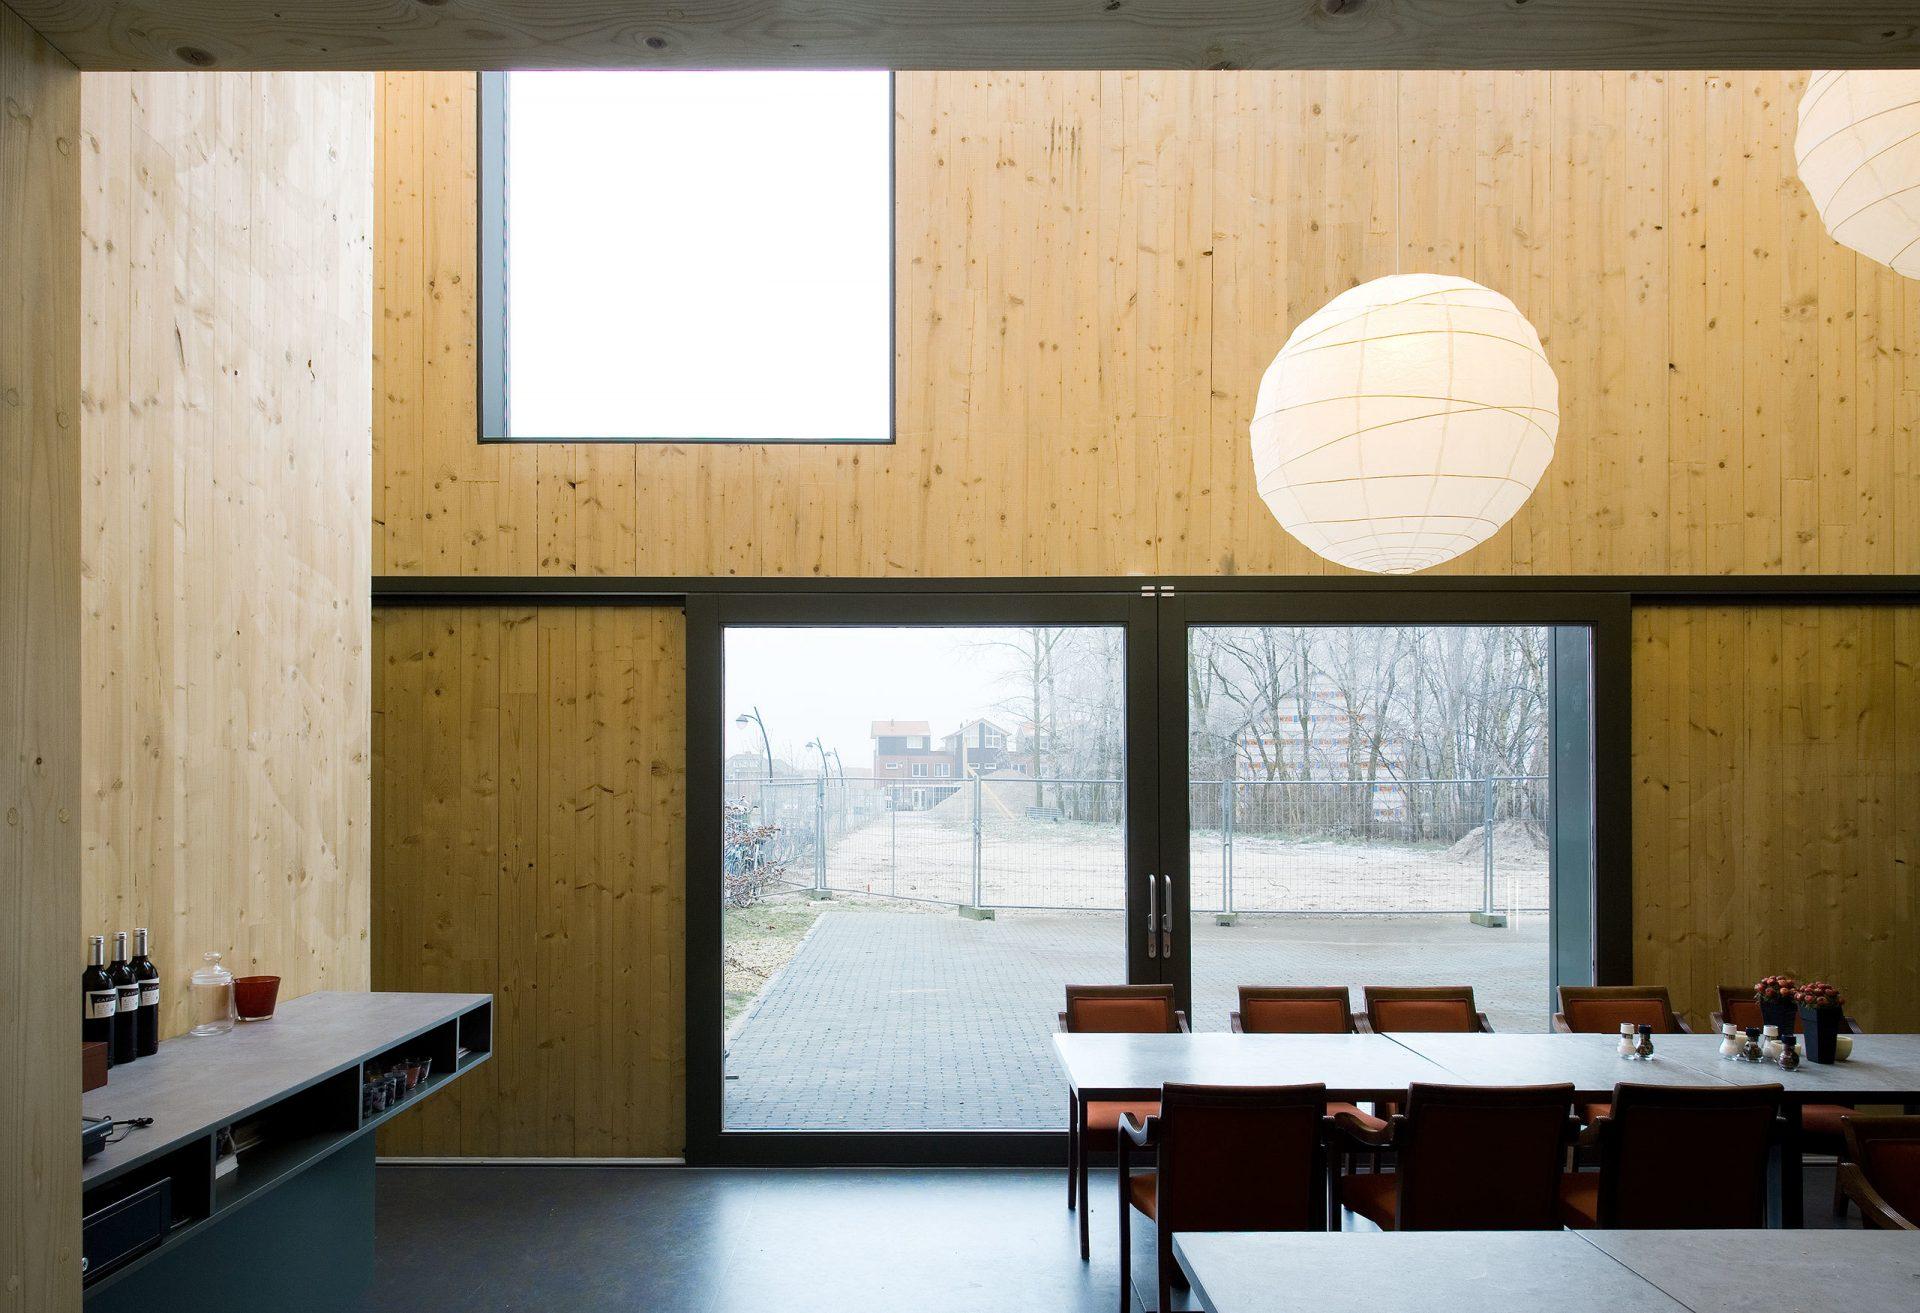 Kamers Cafeteria